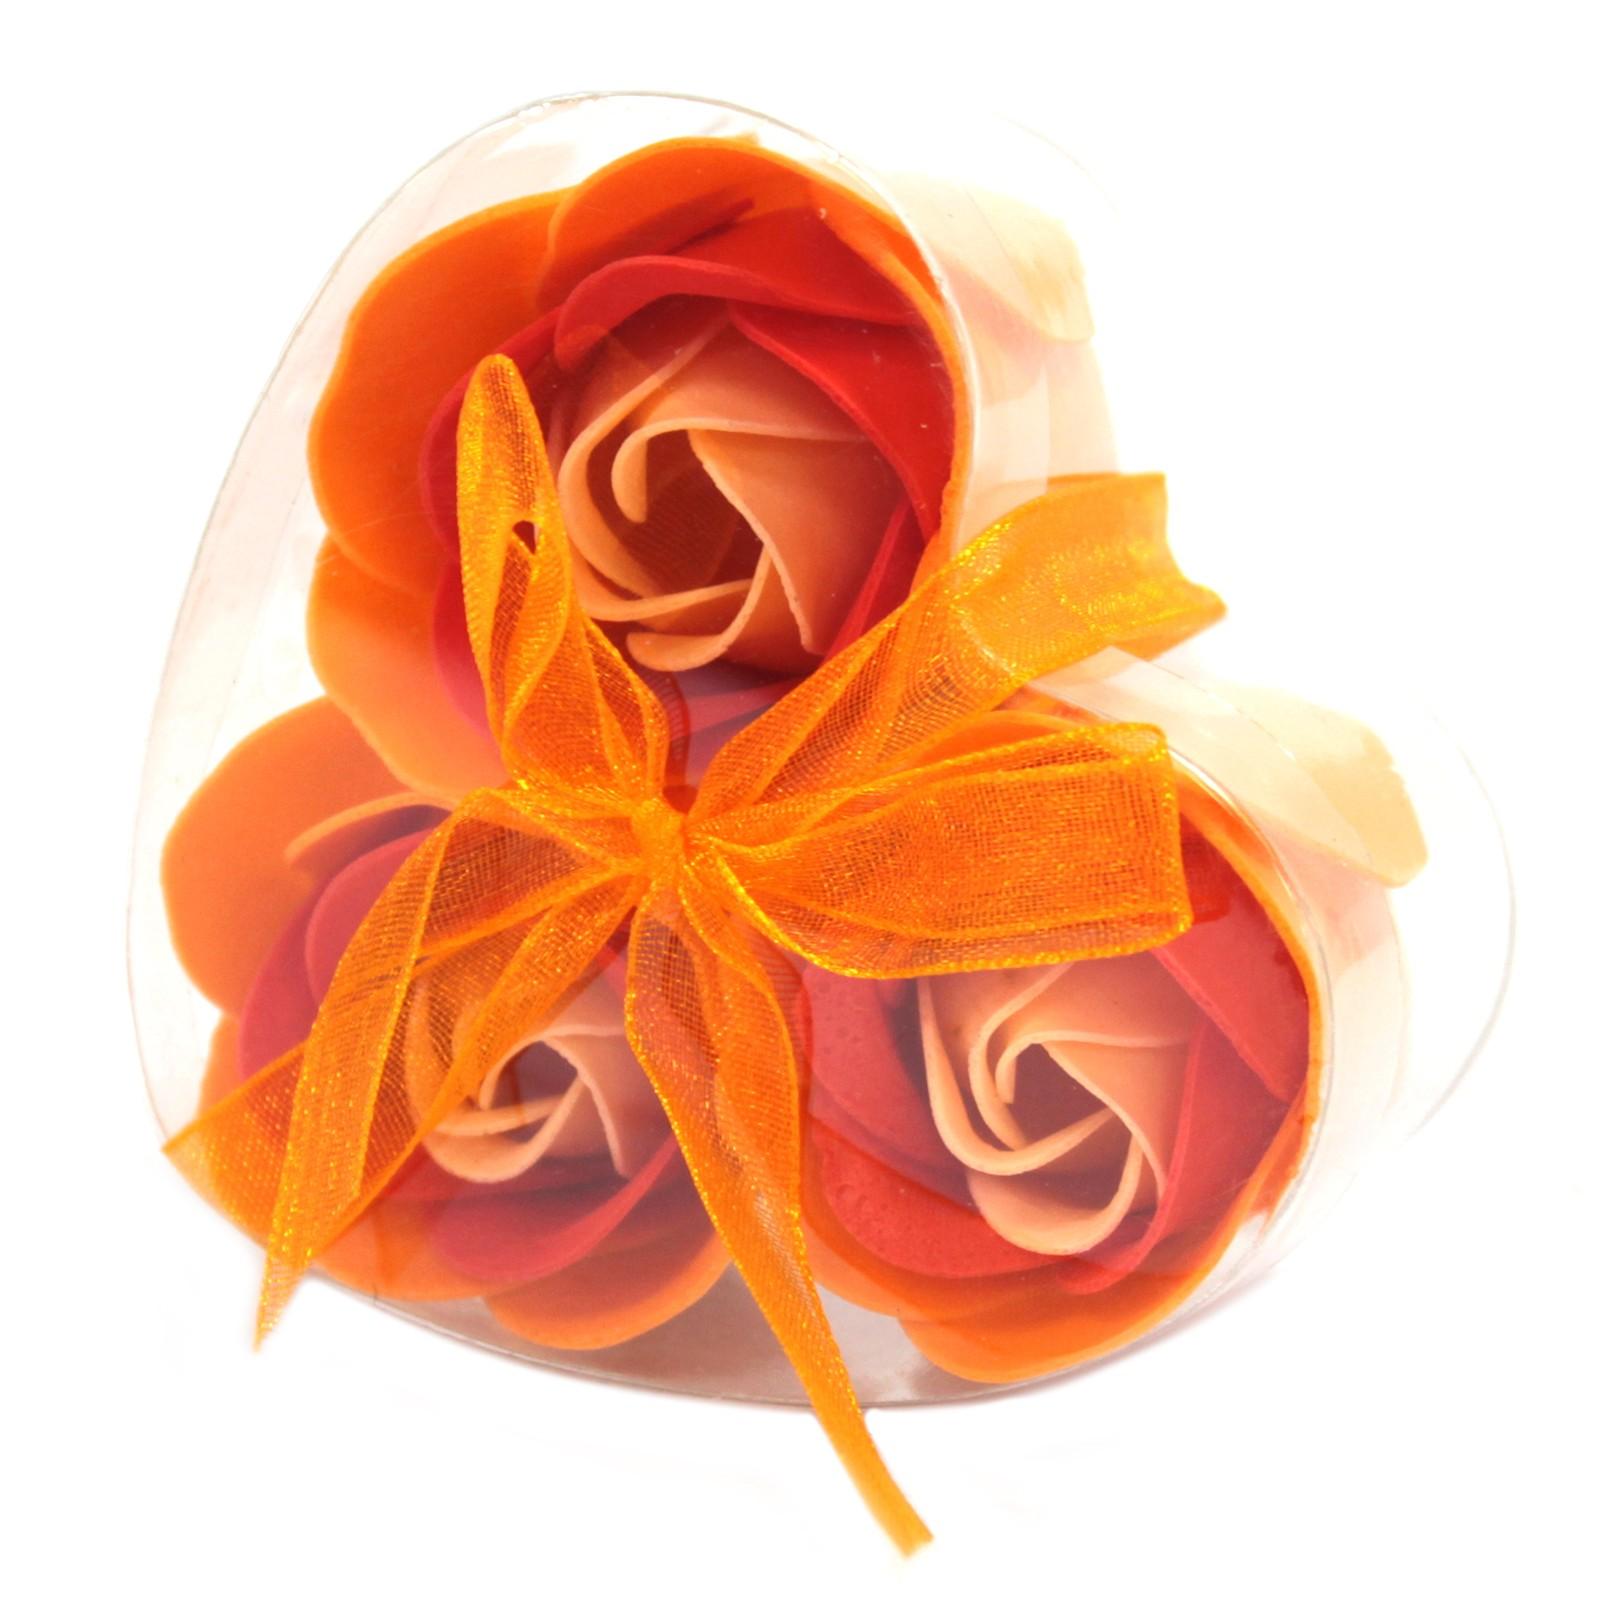 Set of 3 Soap Flower Heart Box Peach Roses